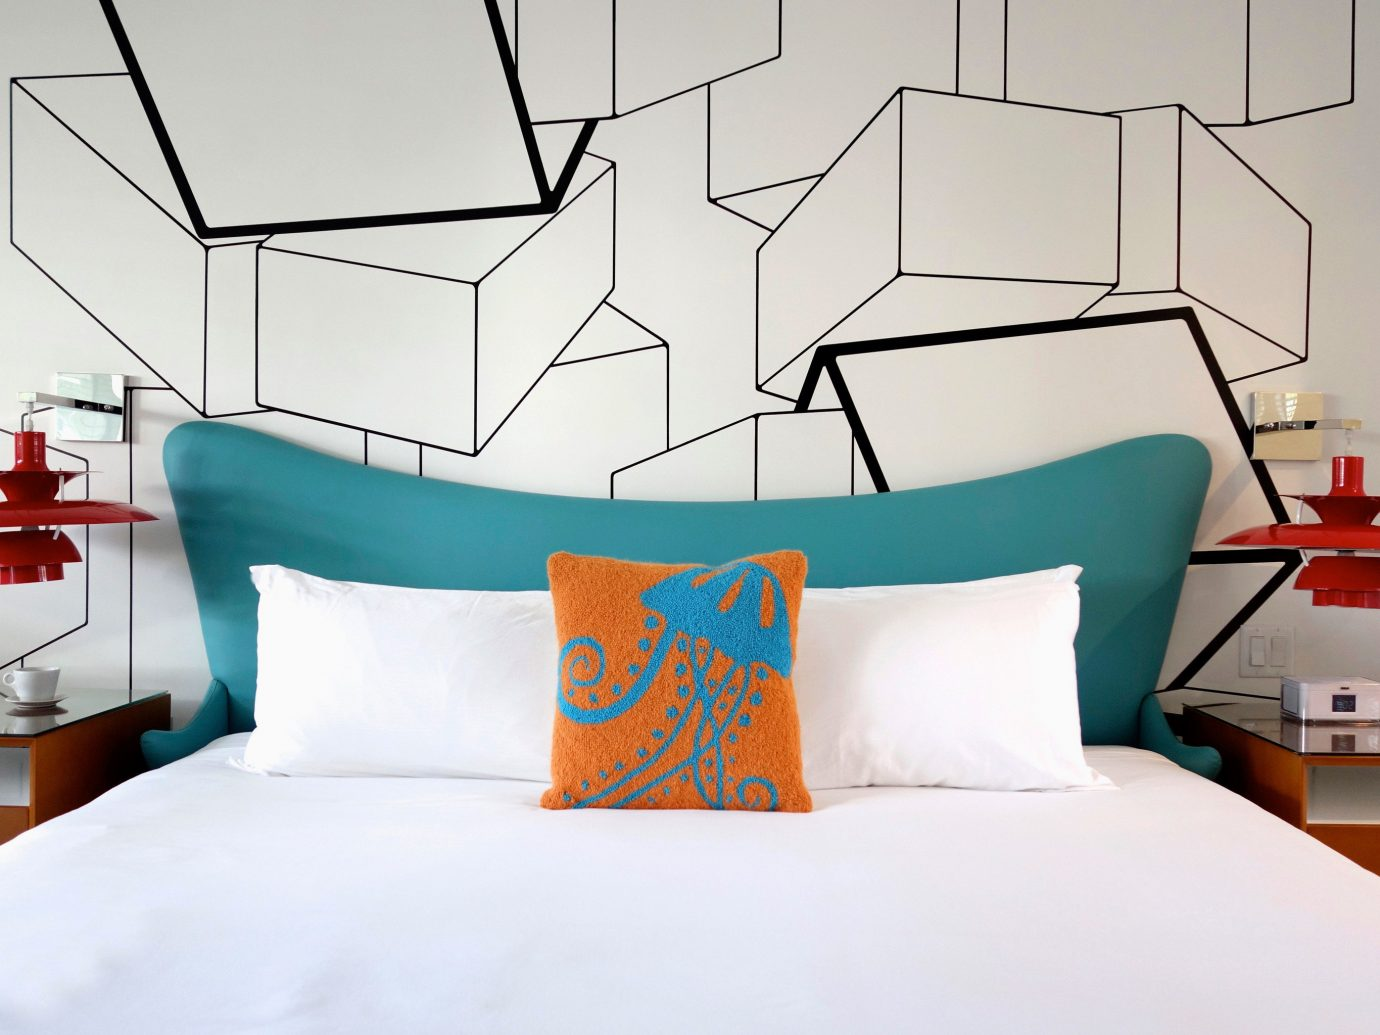 Trip Ideas indoor bed wall room bed sheet duvet cover furniture orange Design interior design pillow textile hotel Bedroom lamp